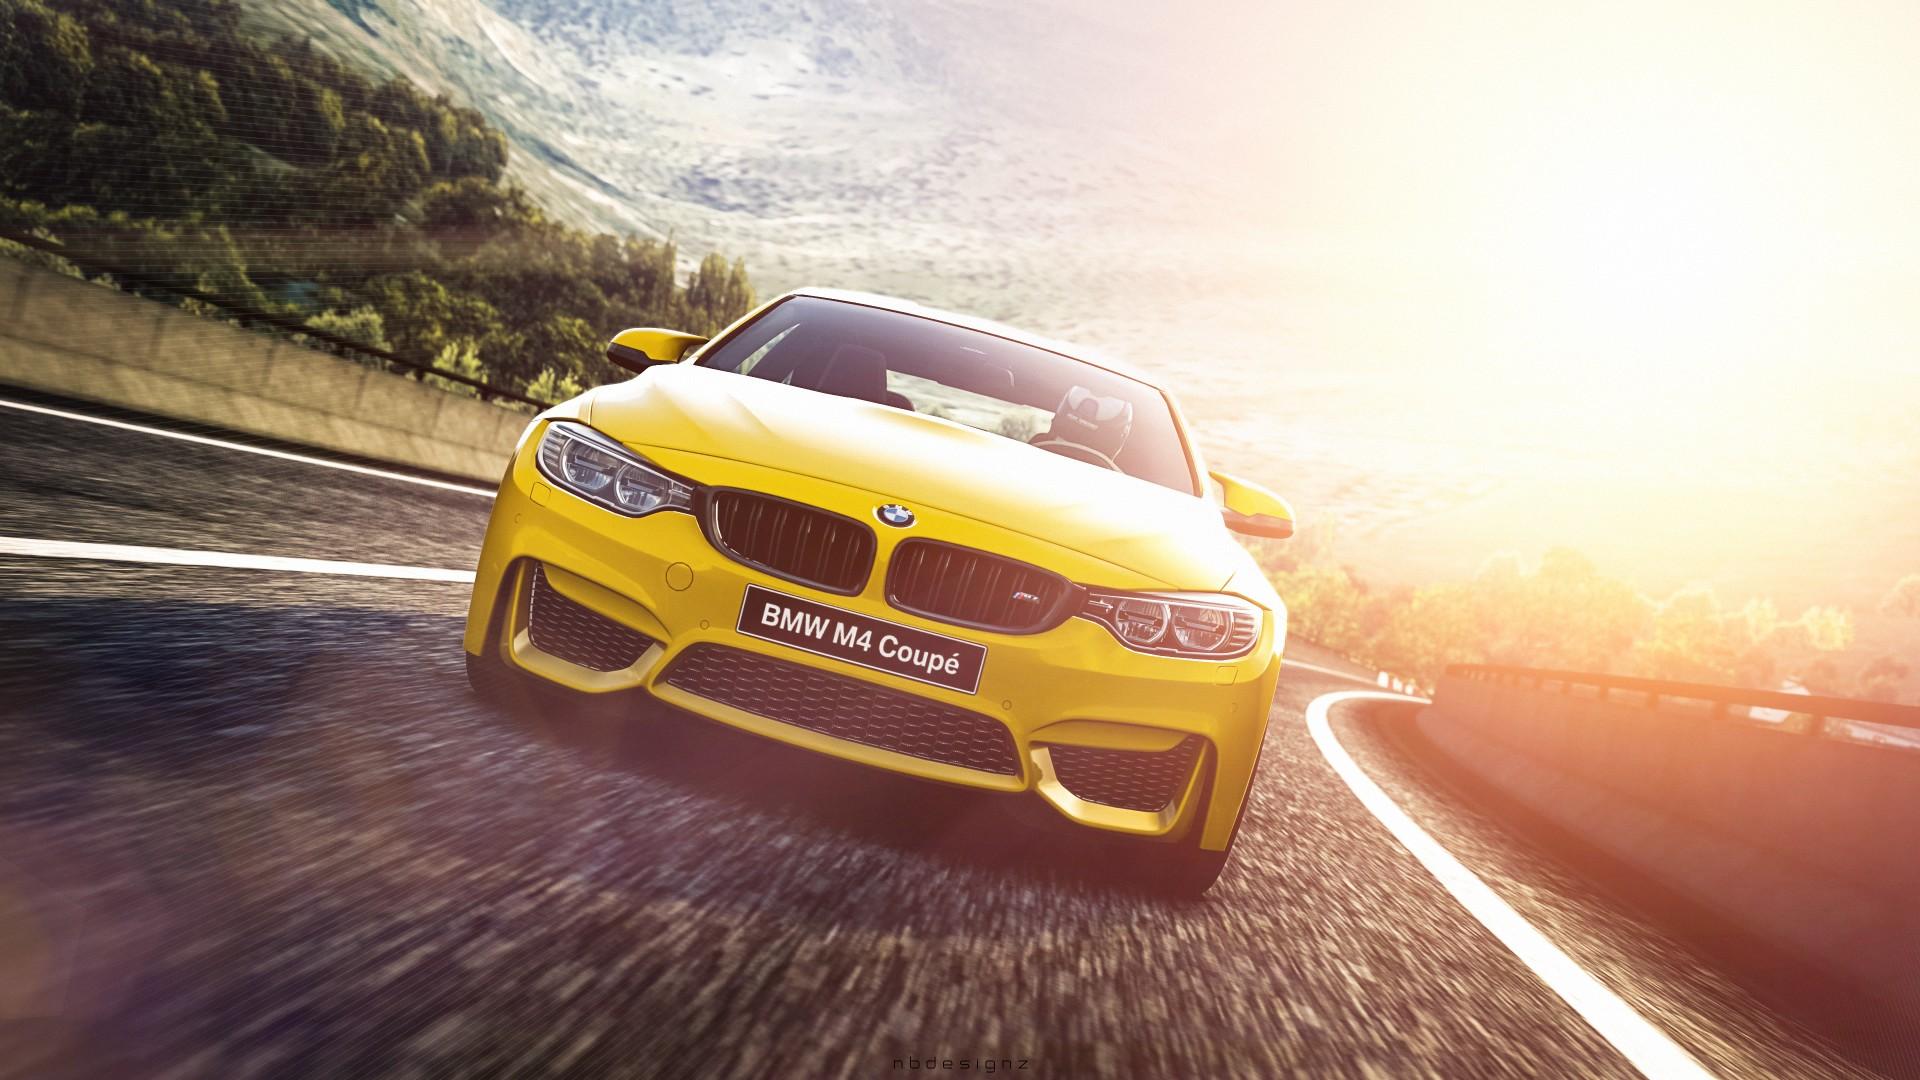 BMW M4 Coupe Gran Turismo 6 Wallpaper | HD Car Wallpapers ...